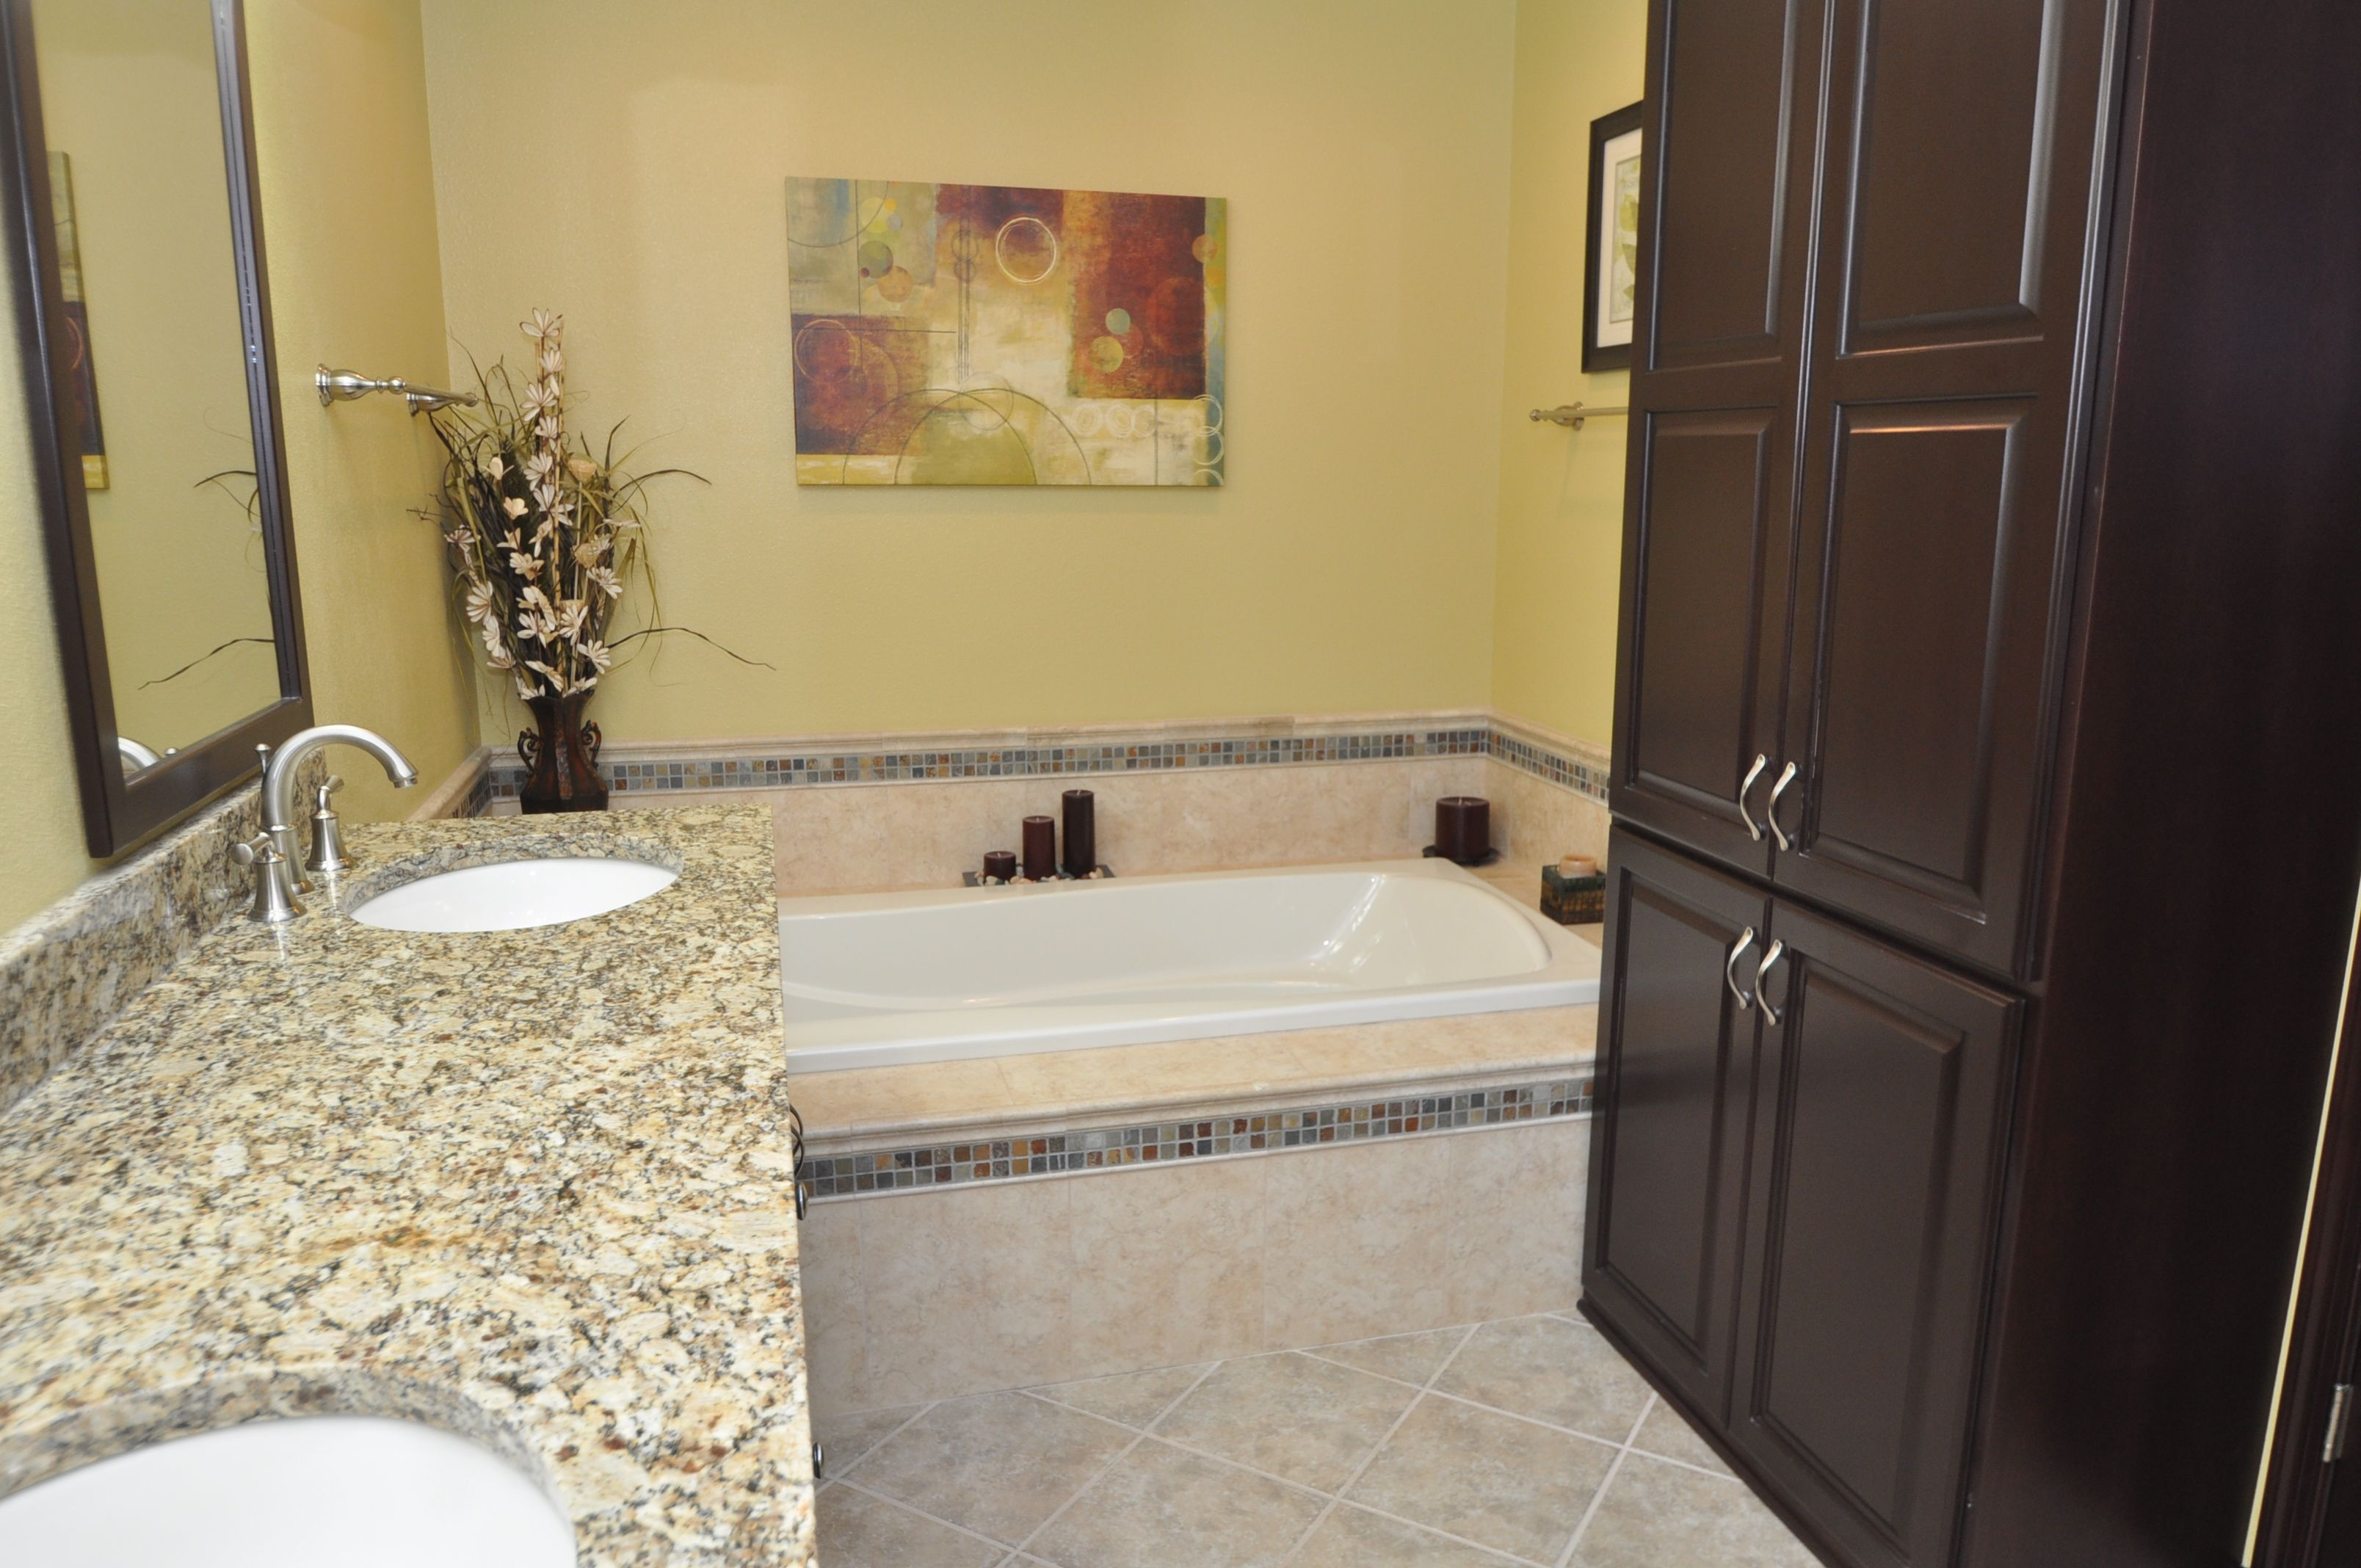 granite countertop, deep jetted tub in master bathroom, custom built vanity